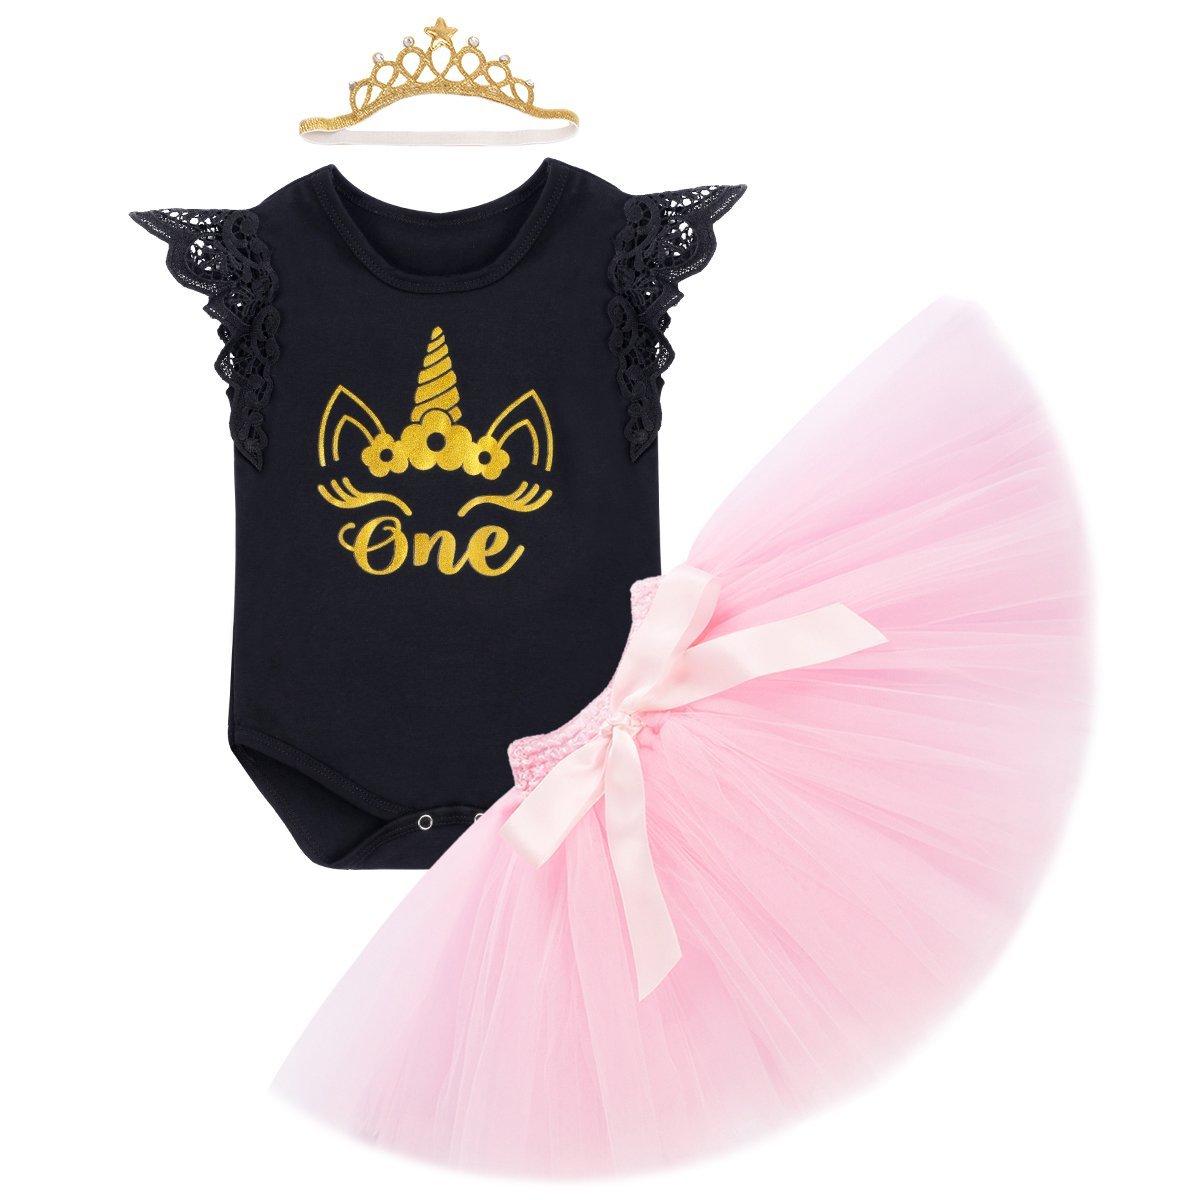 b69c6d5c0 1st Birthday Outfit Baby Girls Unicorn Bodysuit Short/Flutter Sleeve Romper  + Ruffle Tulle Skirt + Crown Headband Cake Smash Dresses up Party Clothes  3Pcs ...